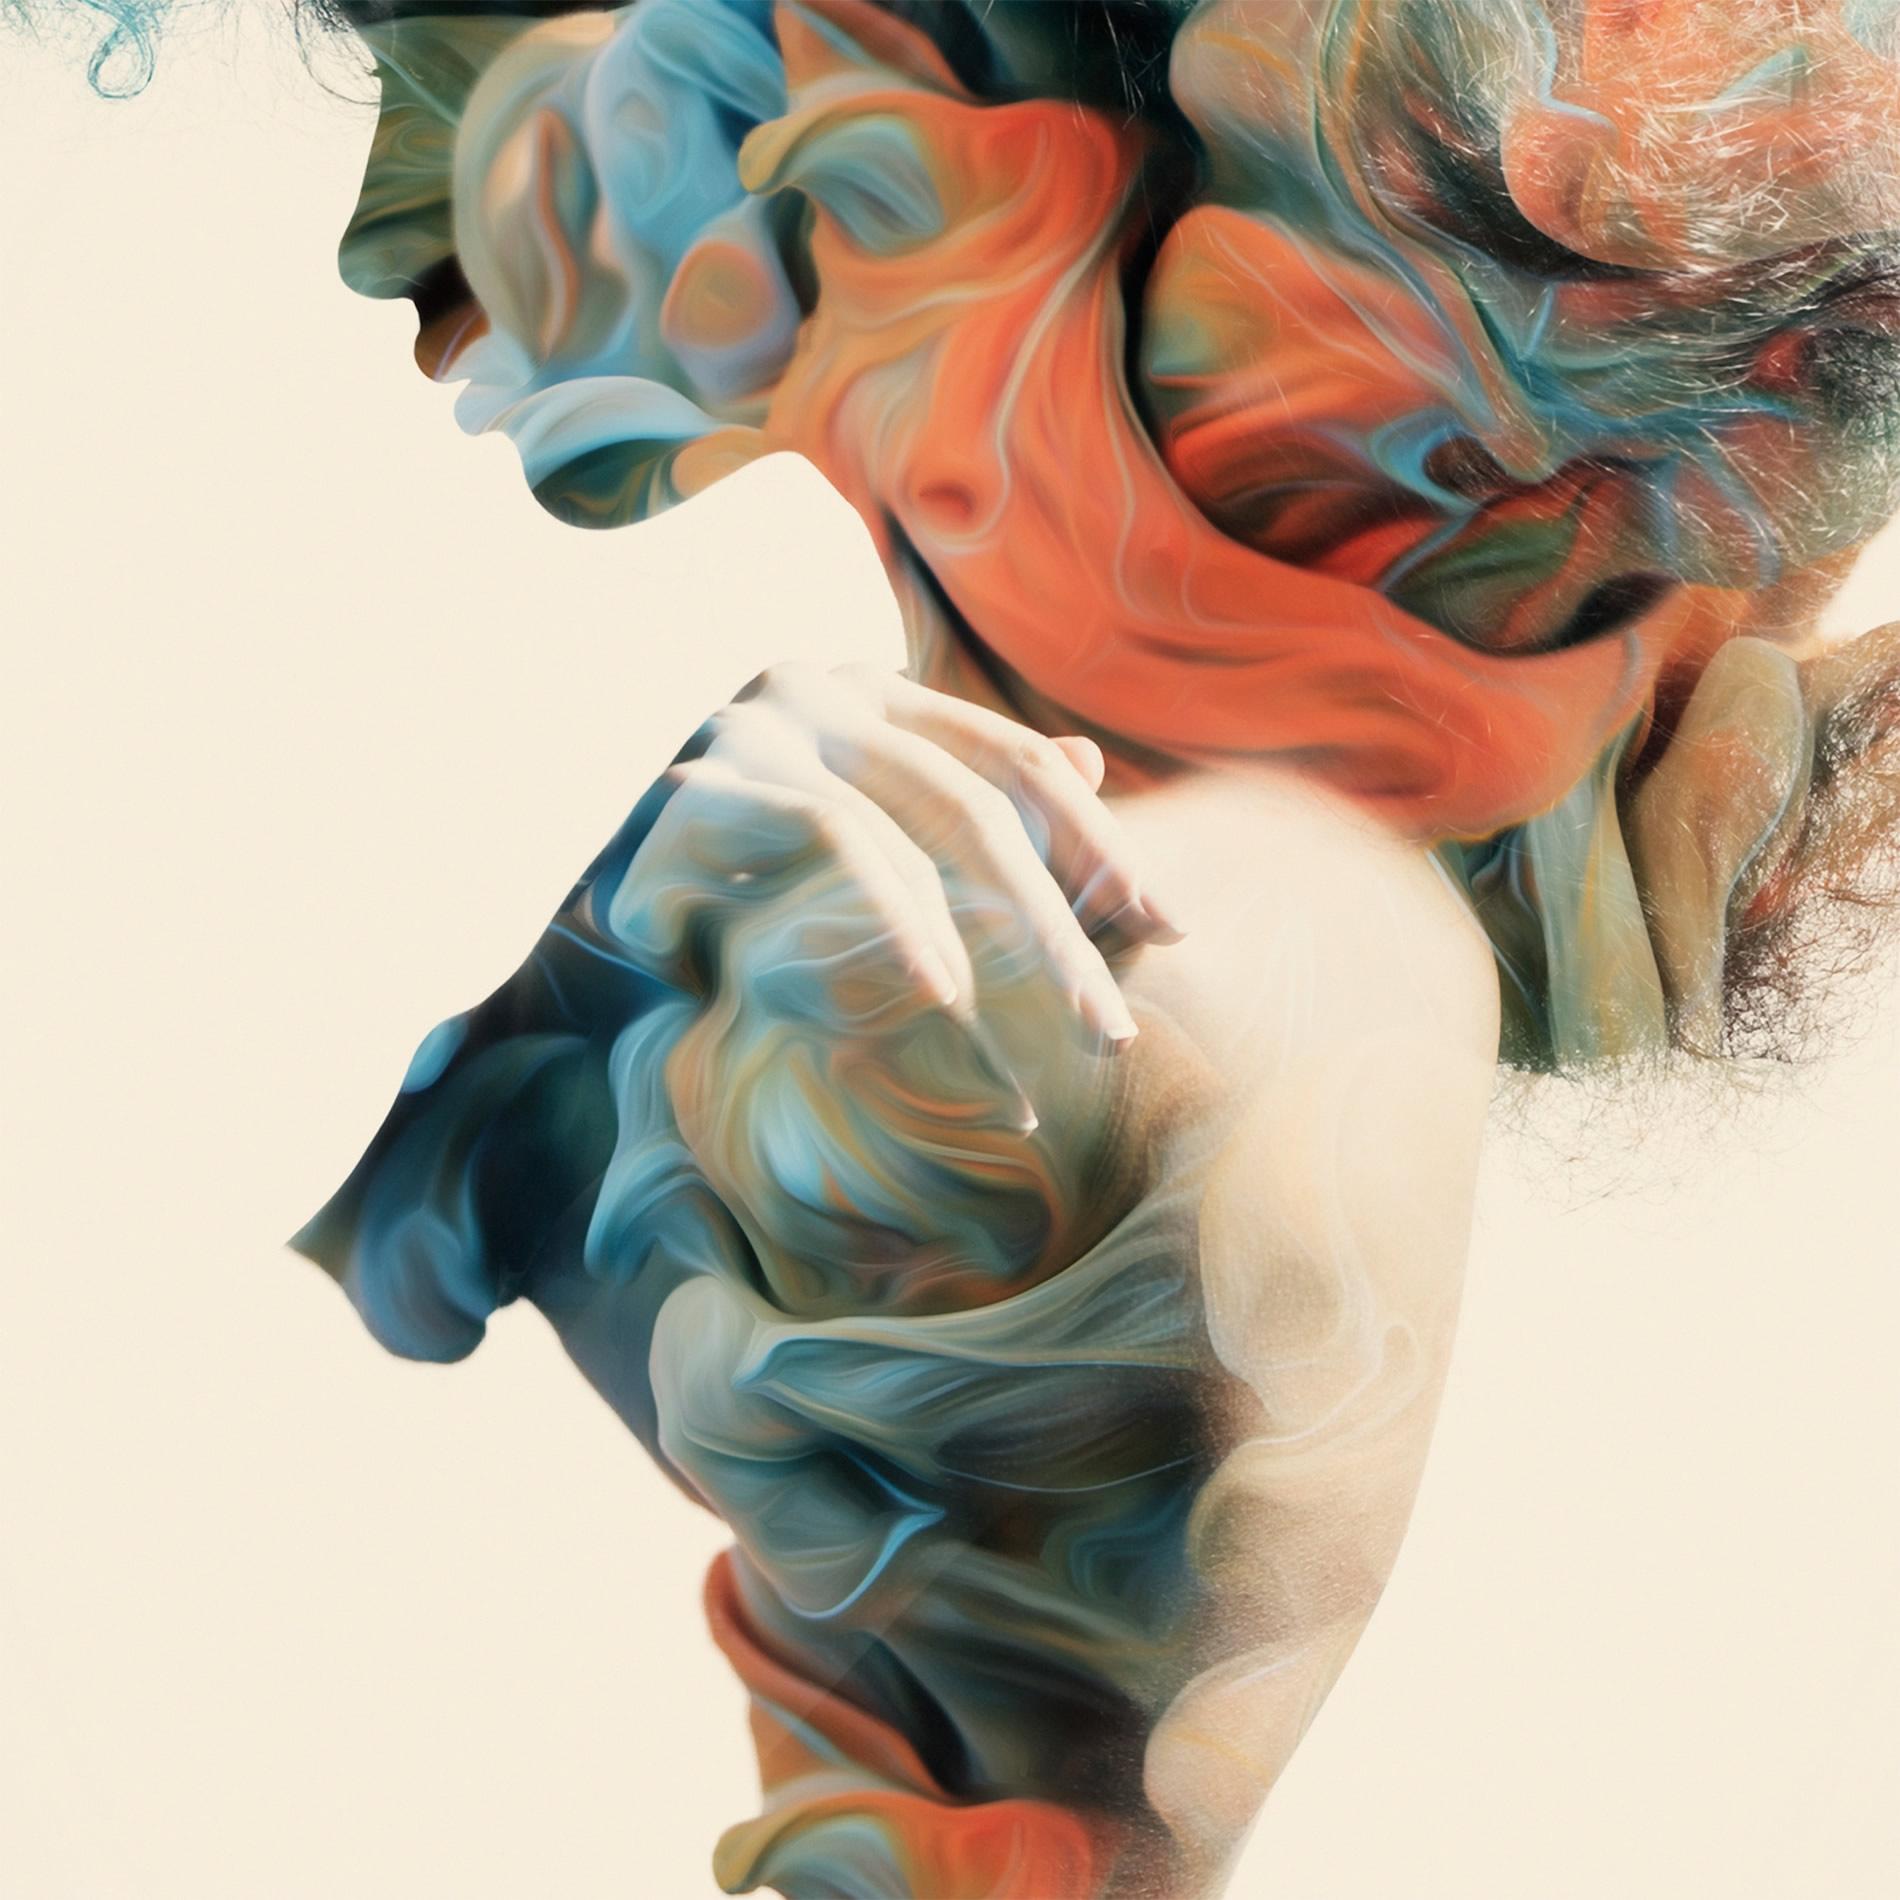 paint liquid, Trivial Expose by alberto seveso